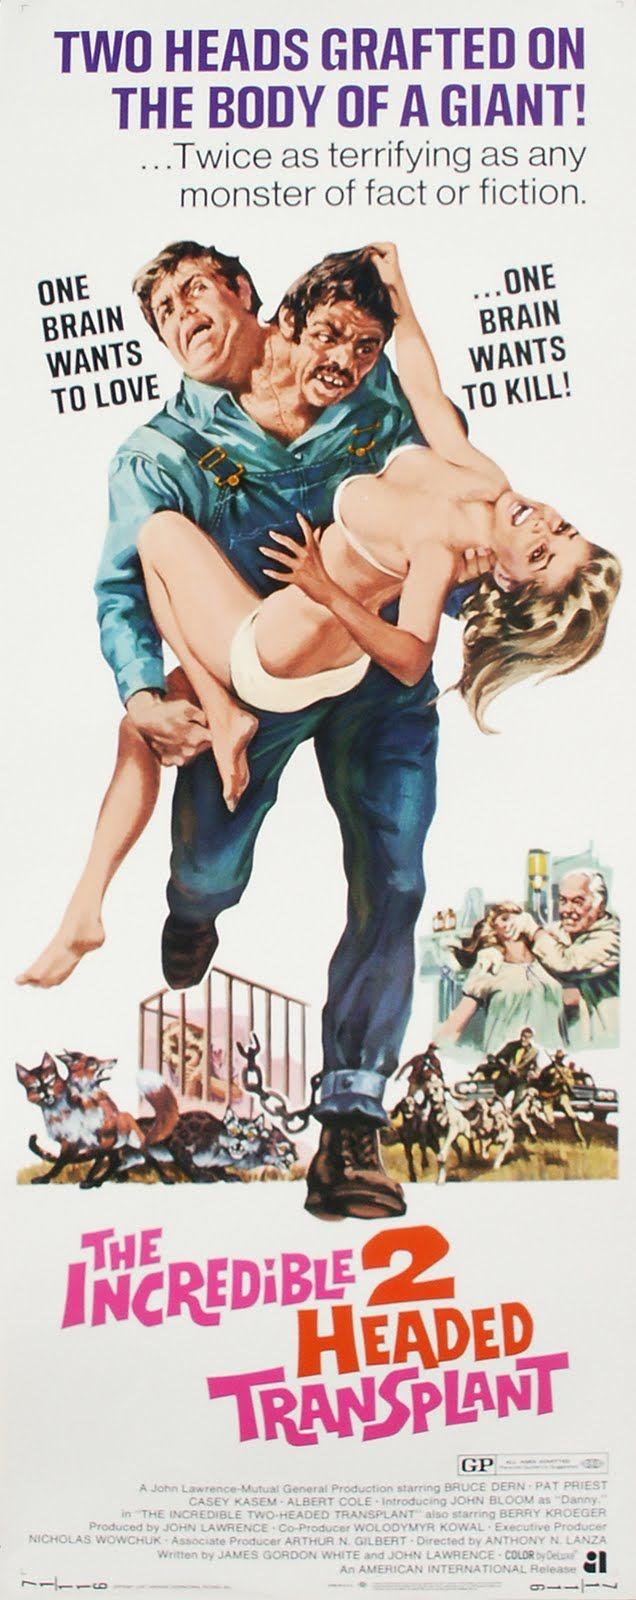 The Incredible 2-Headed Transplant (1971) Stars: Bruce Dern, Pat Priest, Casey Kasem, Albert Cole, John Bloom, Berry Kroeger ~ Director: Anthony M. Lanza